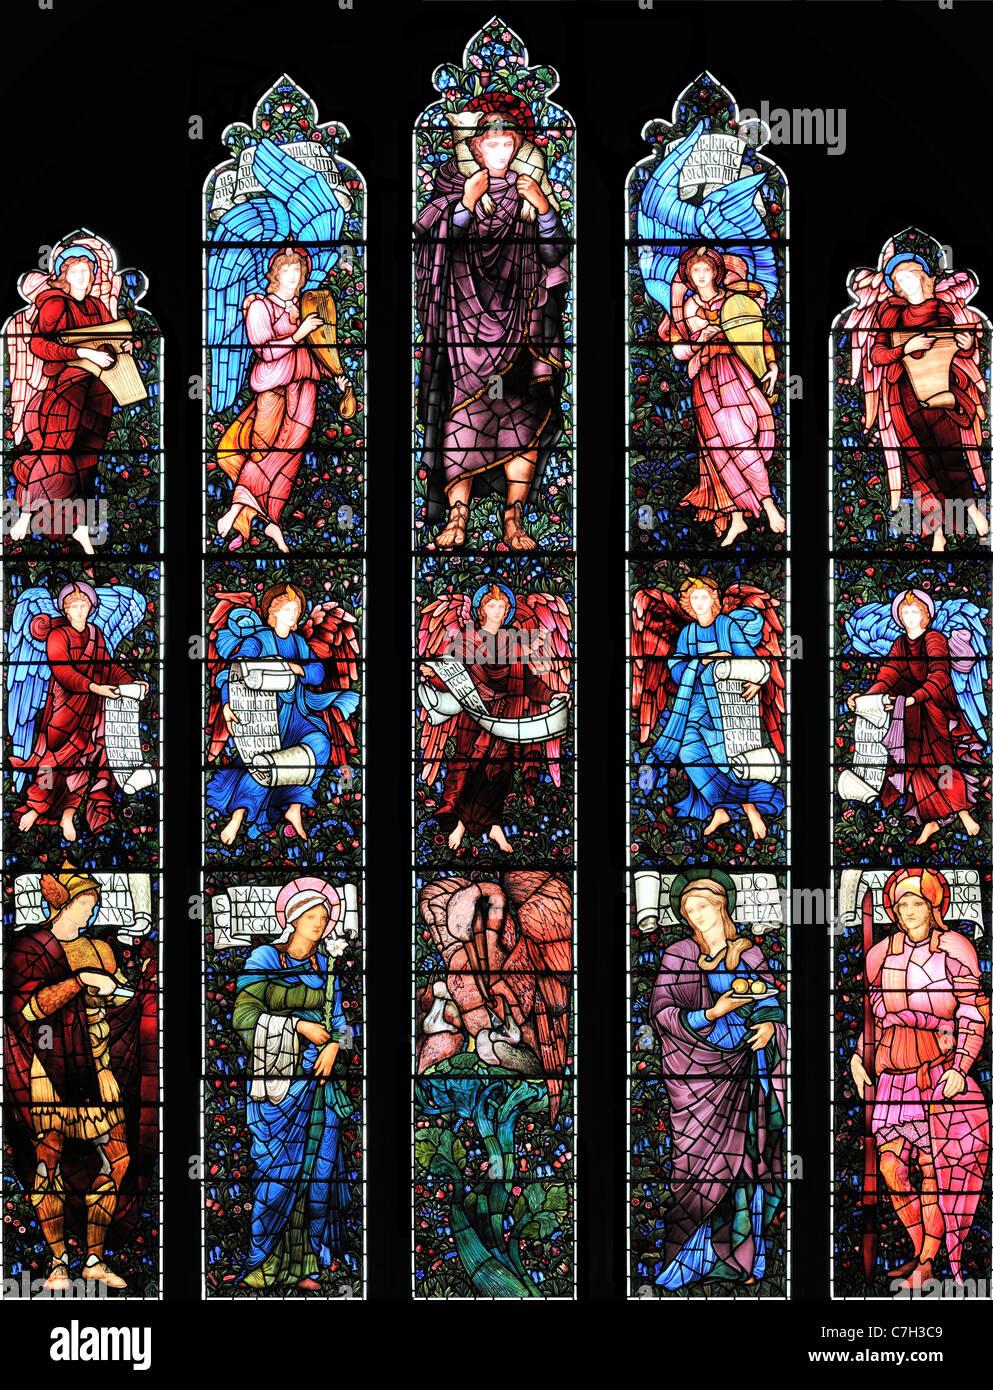 The East window, designed by Edward Burne-Jones, in St Martin's Church, Brampton, Cumbria, England Stock Photo